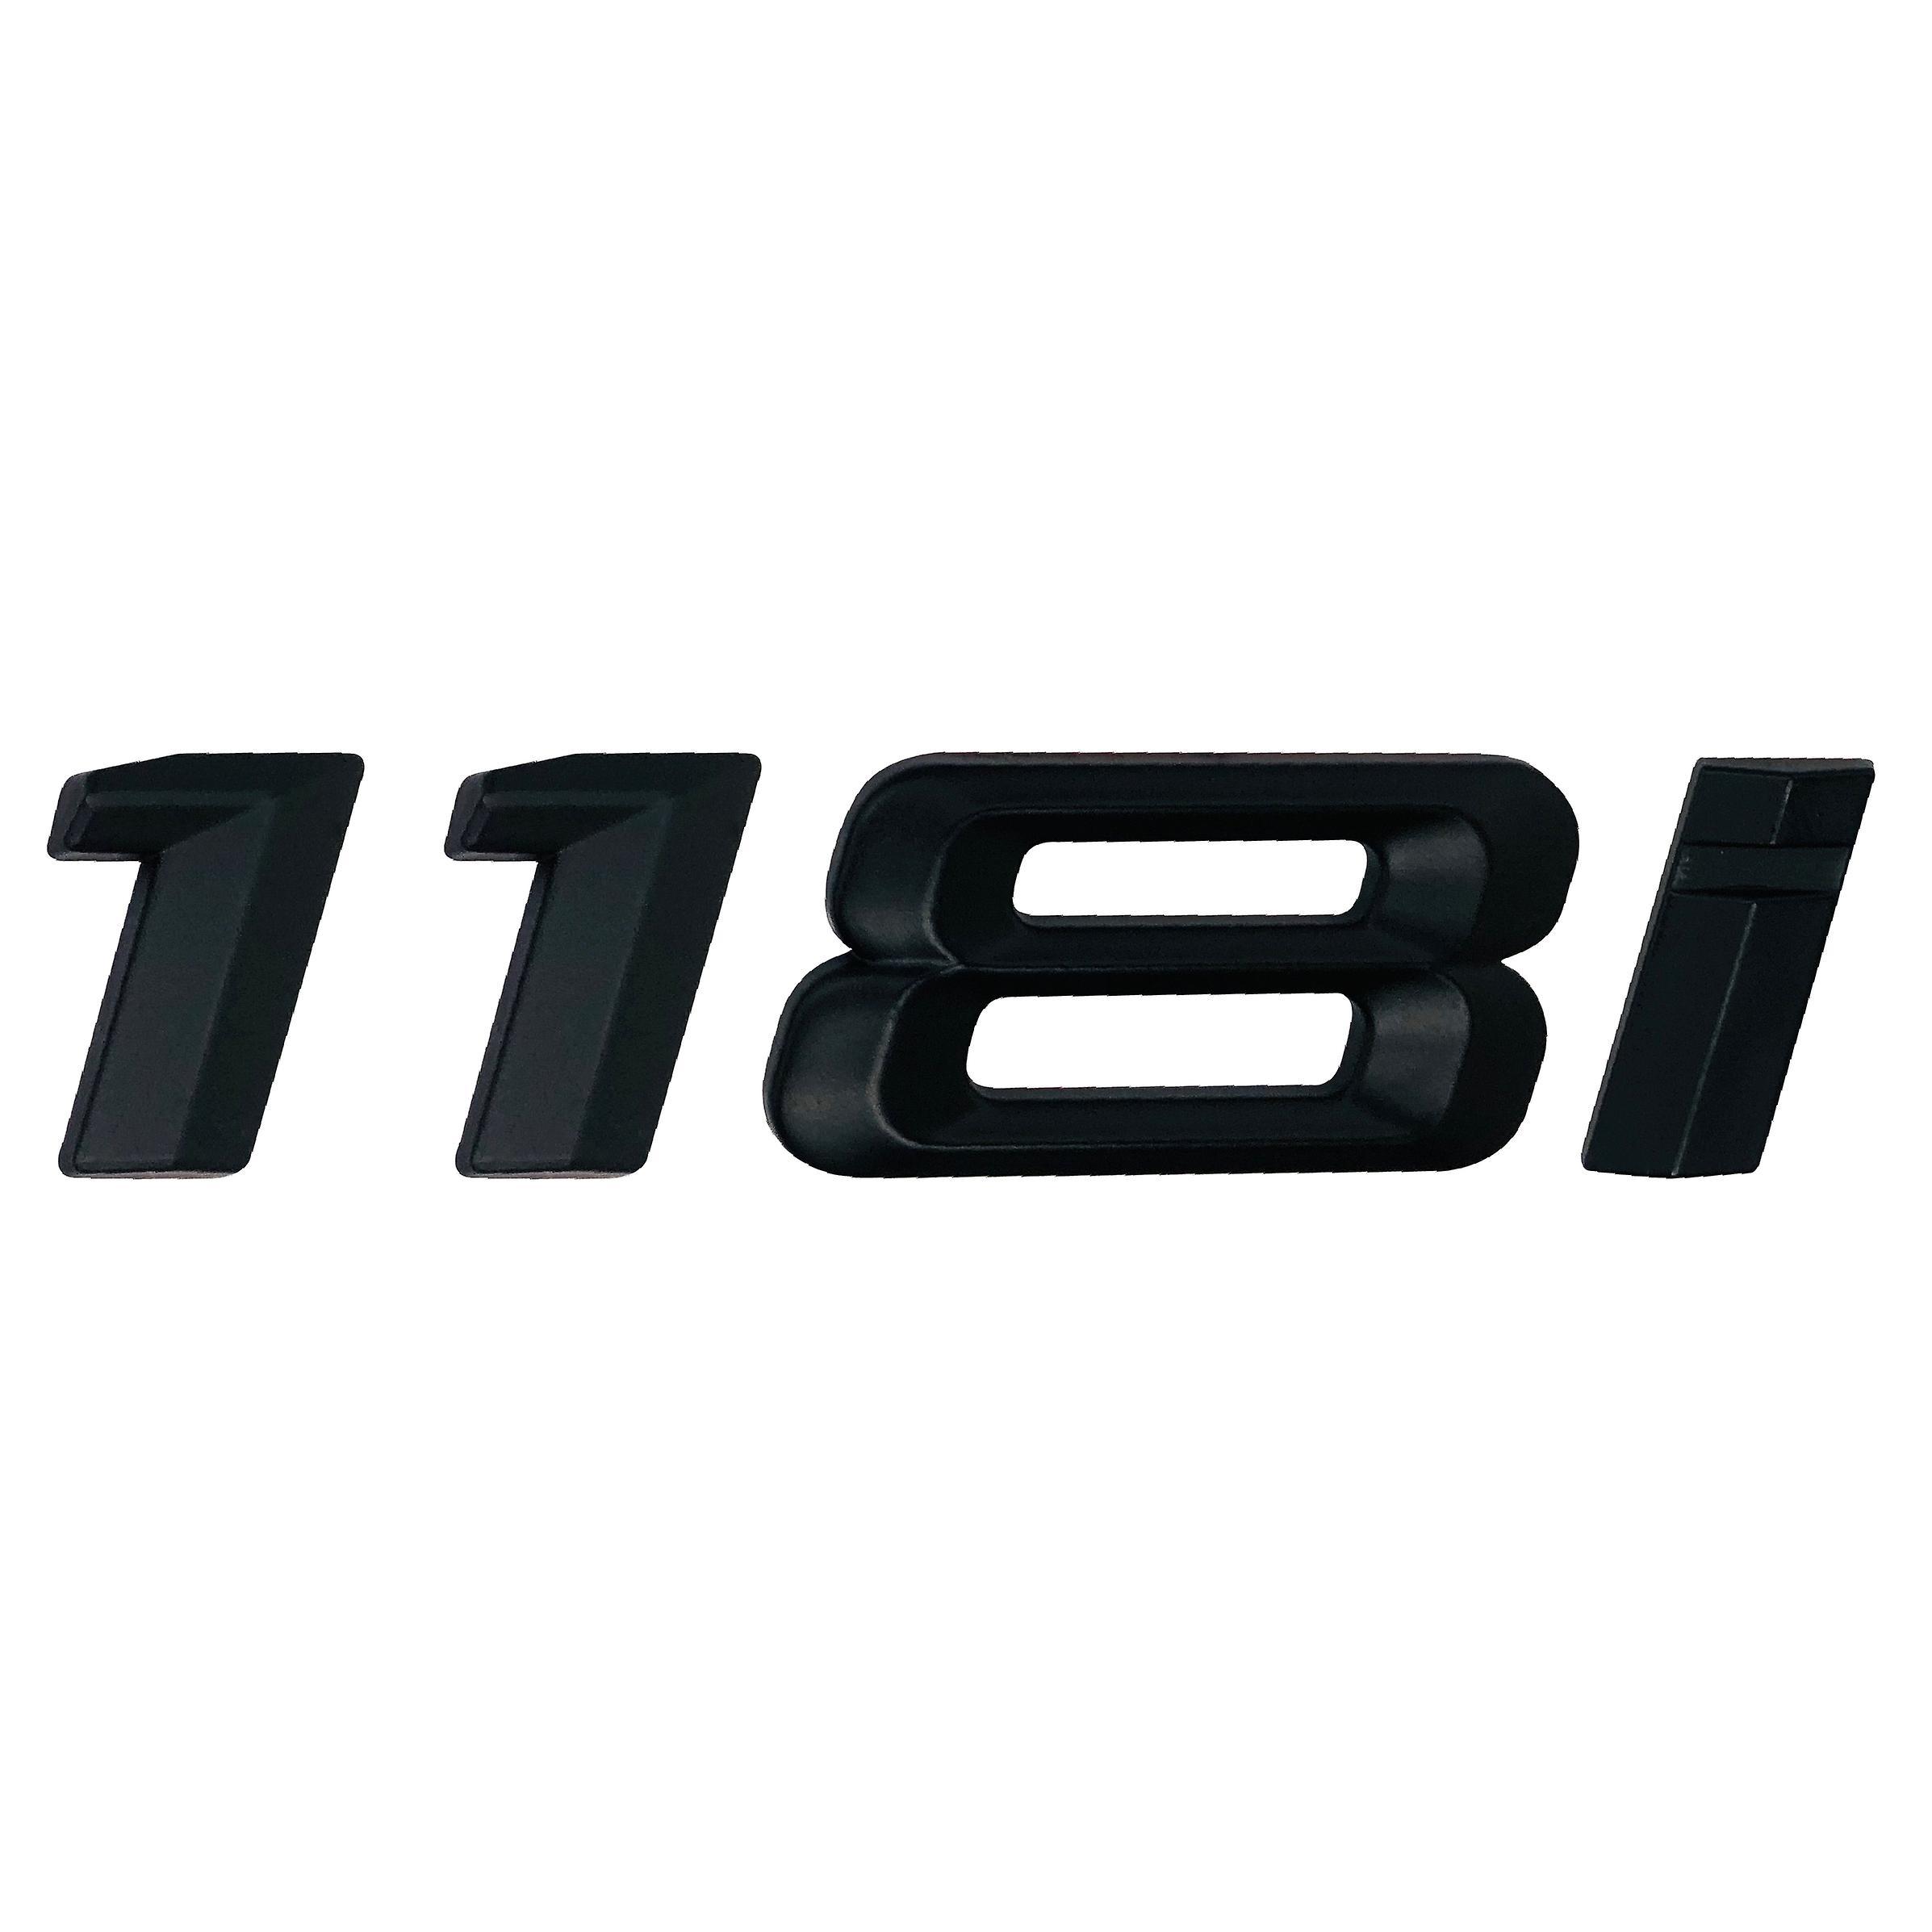 Matt Black GLS63 Rear Boot Badge Emblem Letter Number Compatible For GL-Class X164 X166 X167 AMG